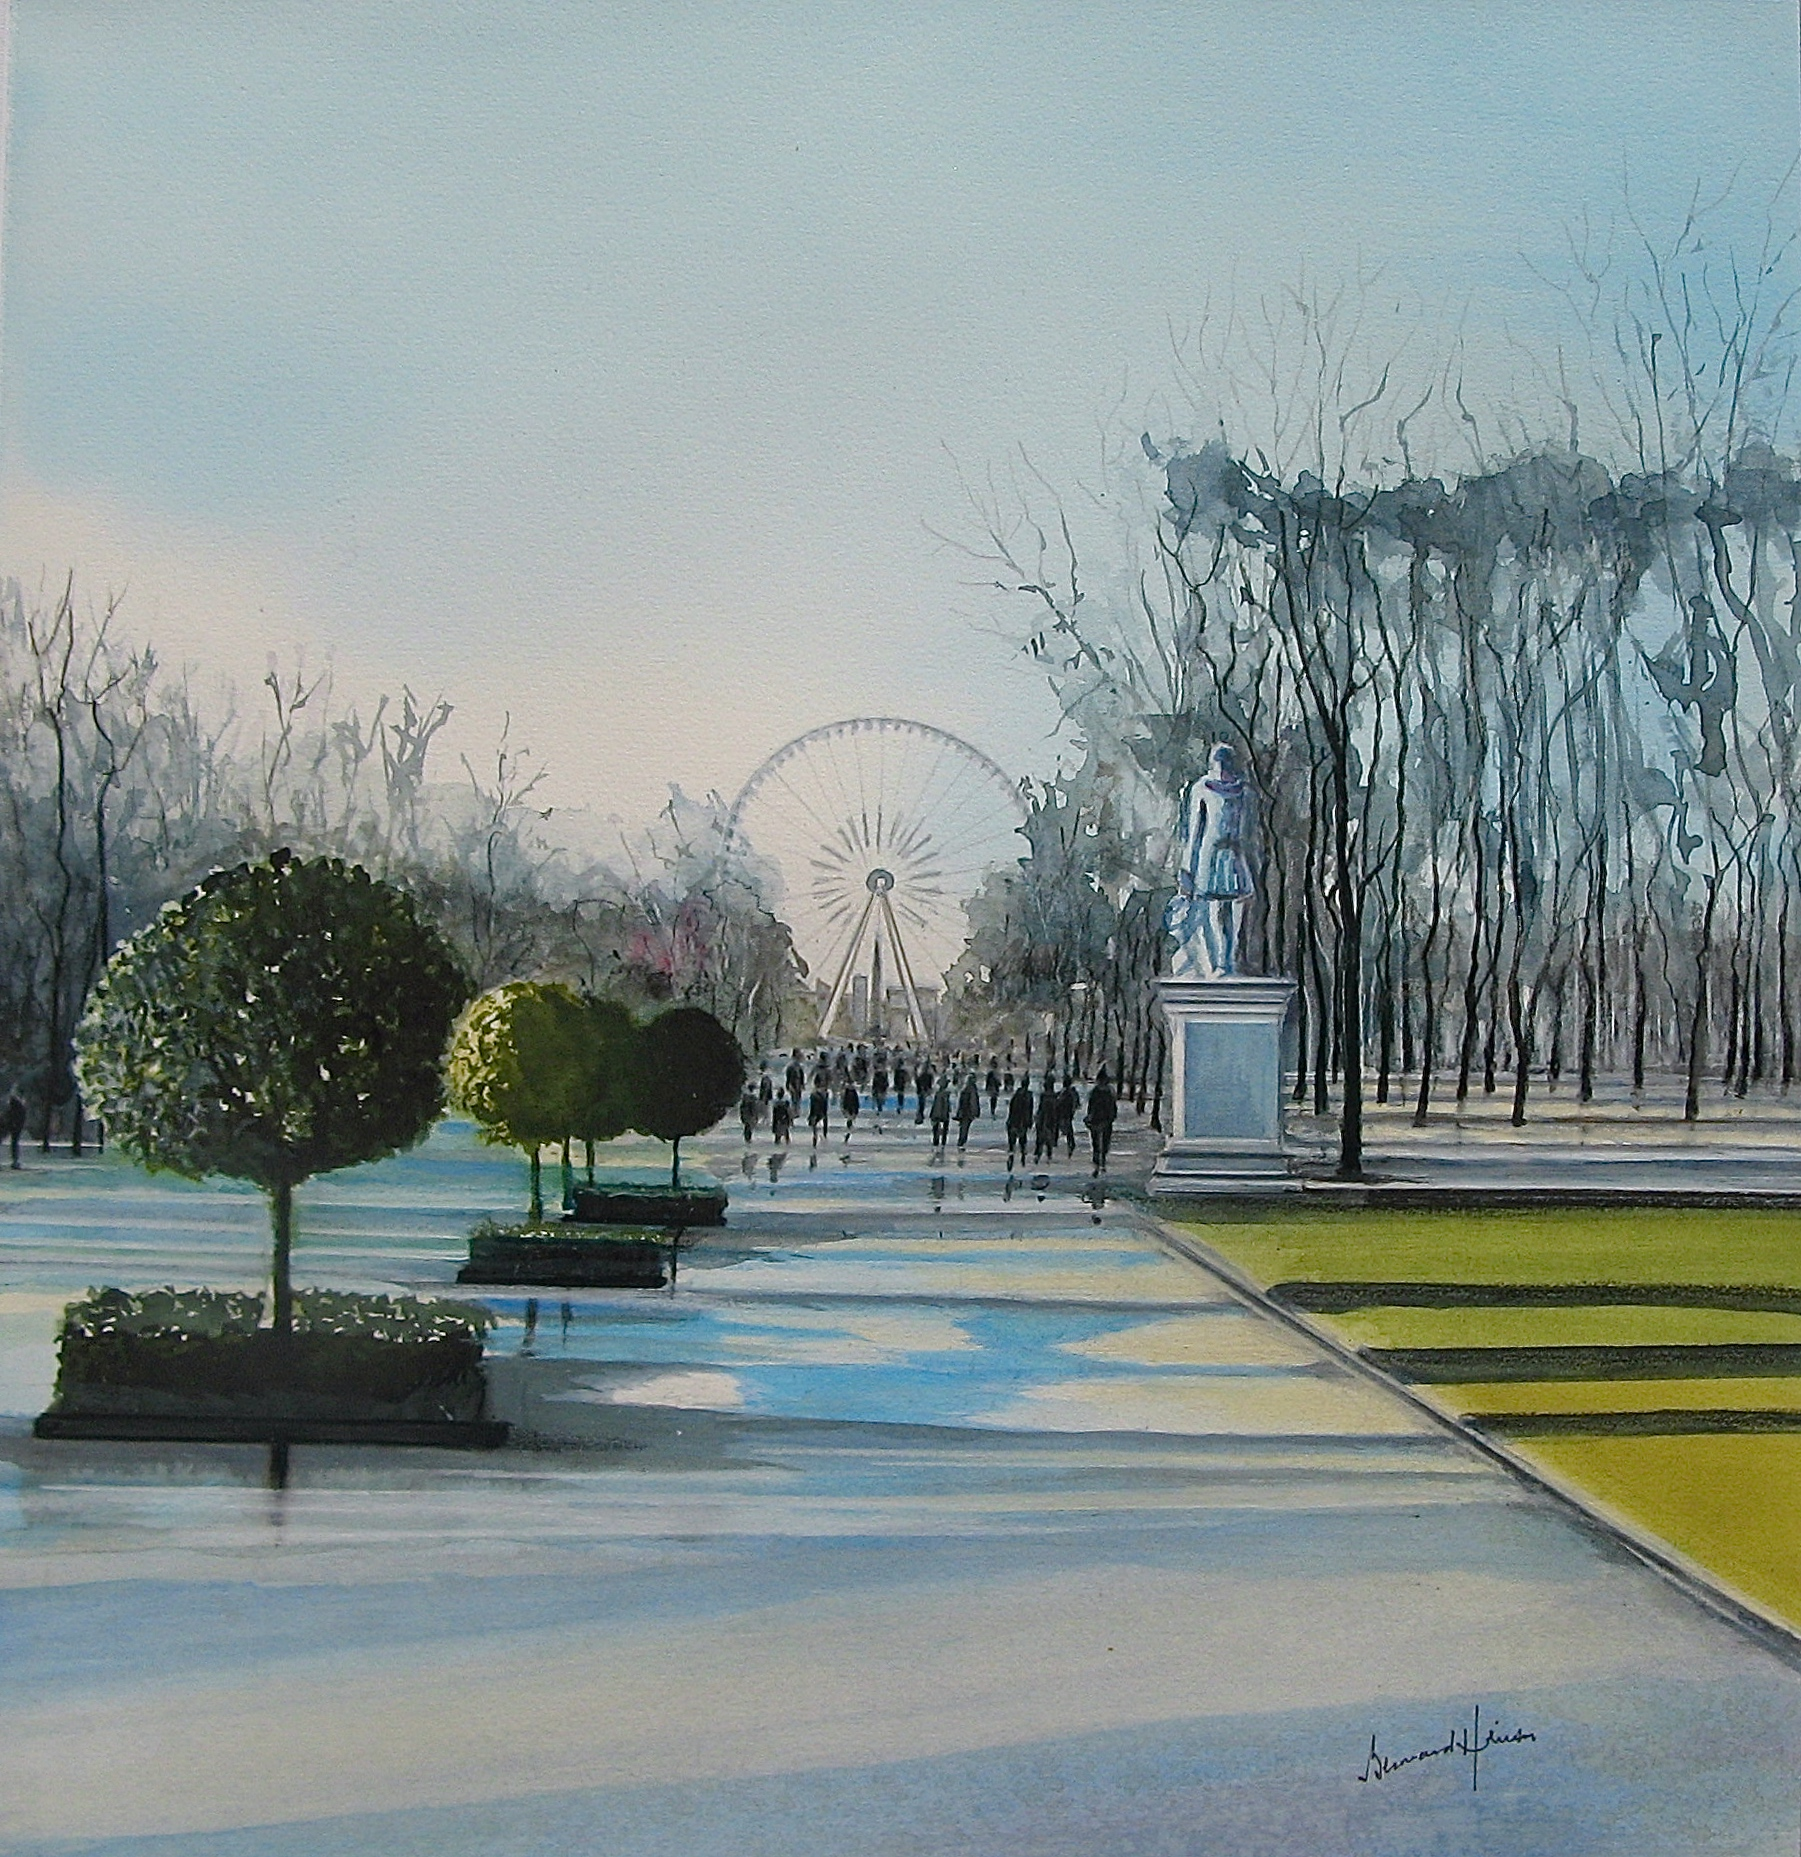 Paris et sa grande roue